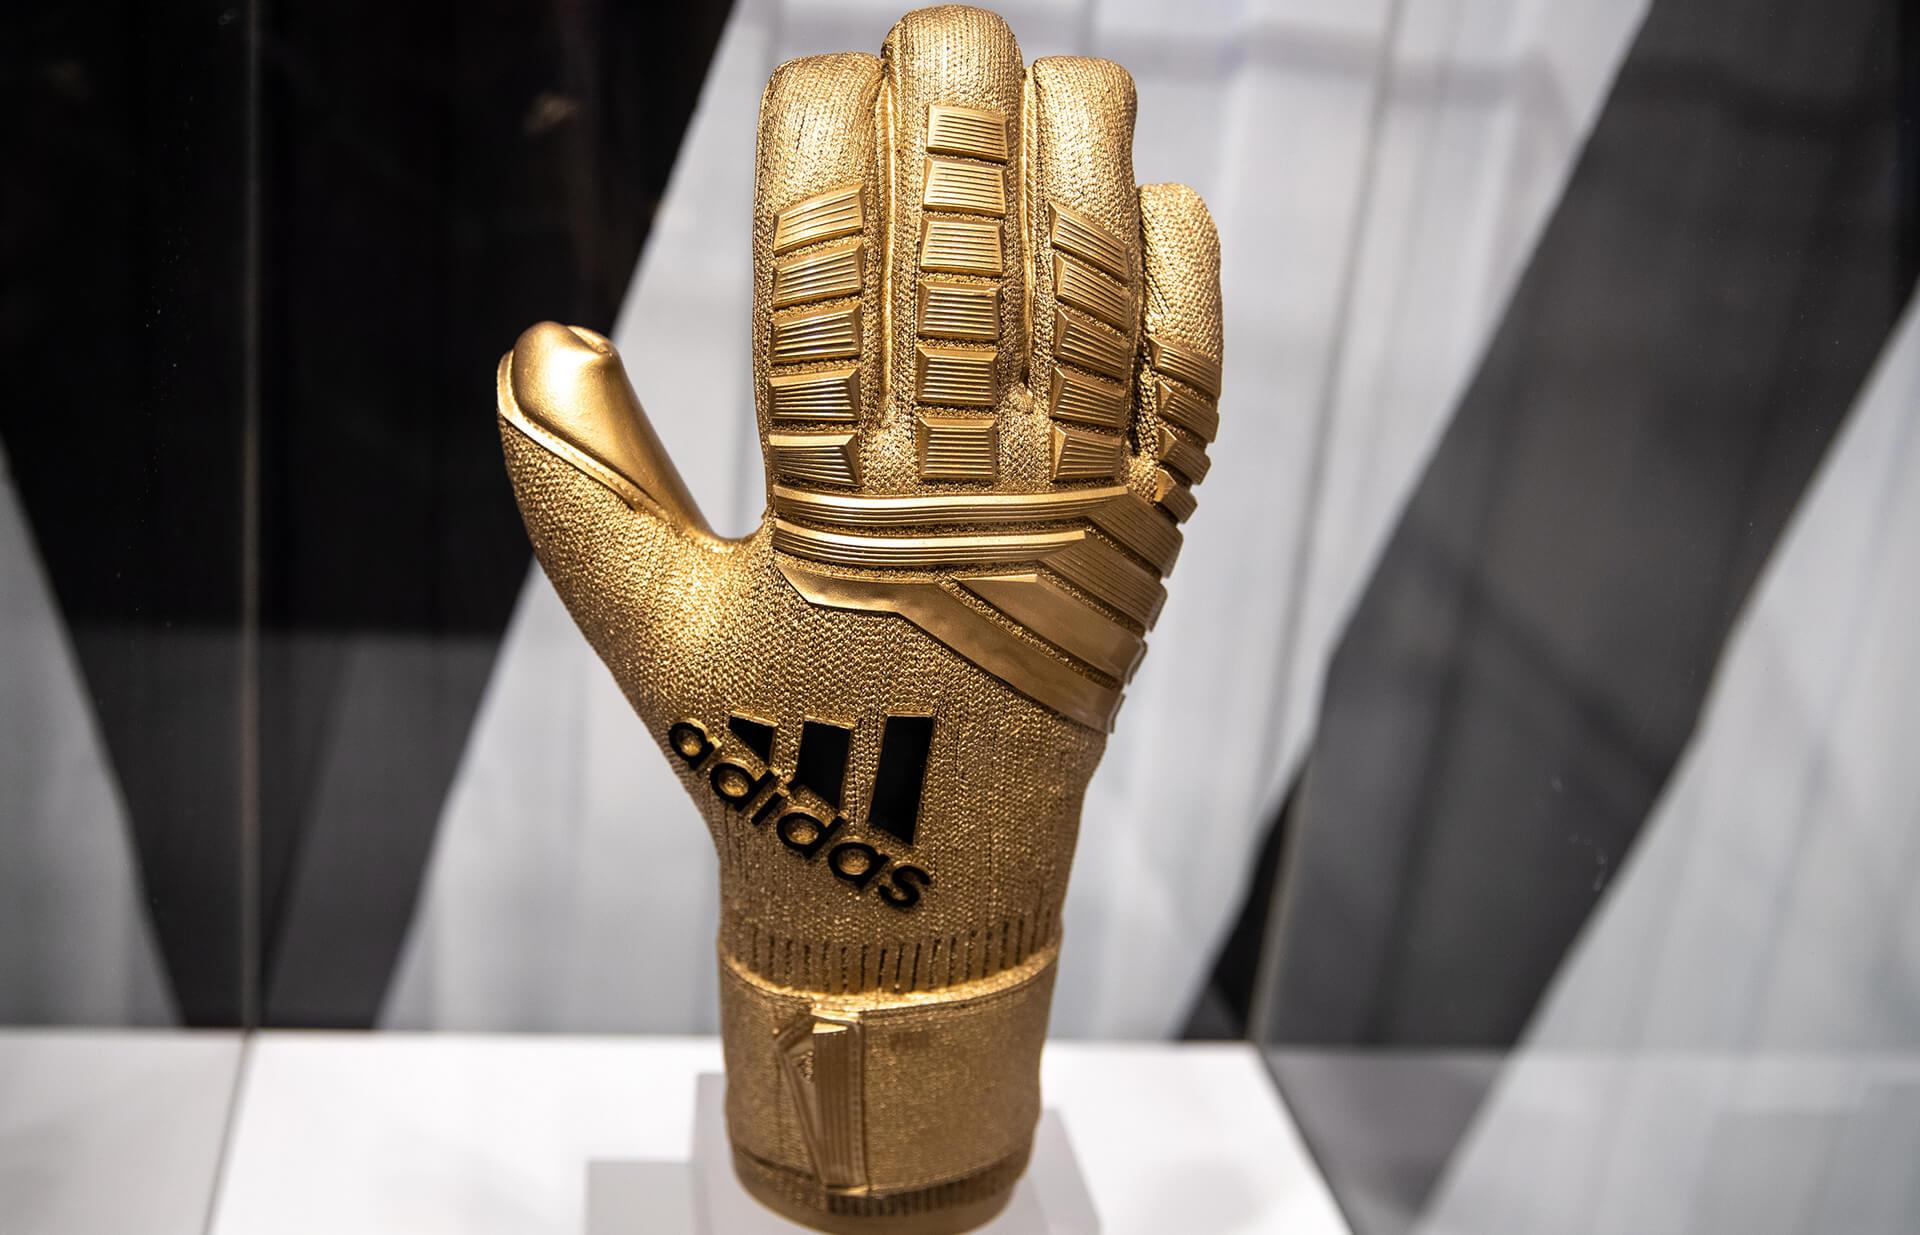 FIFA 2018 brand - Adidas